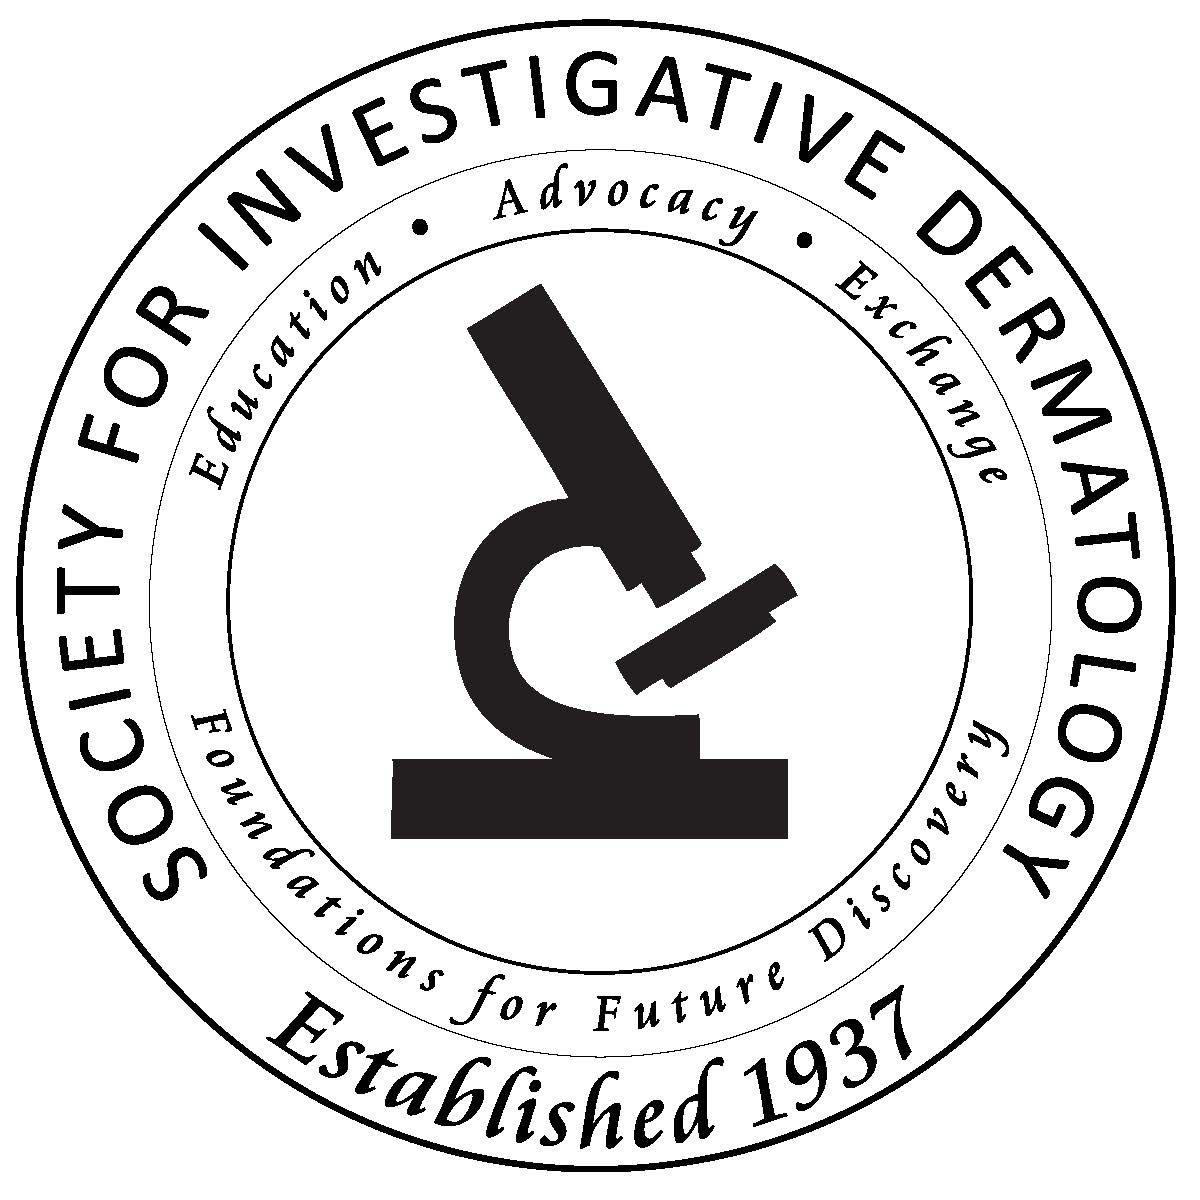 75th Anniversary, 1937 2012 Dermatology, Integrative